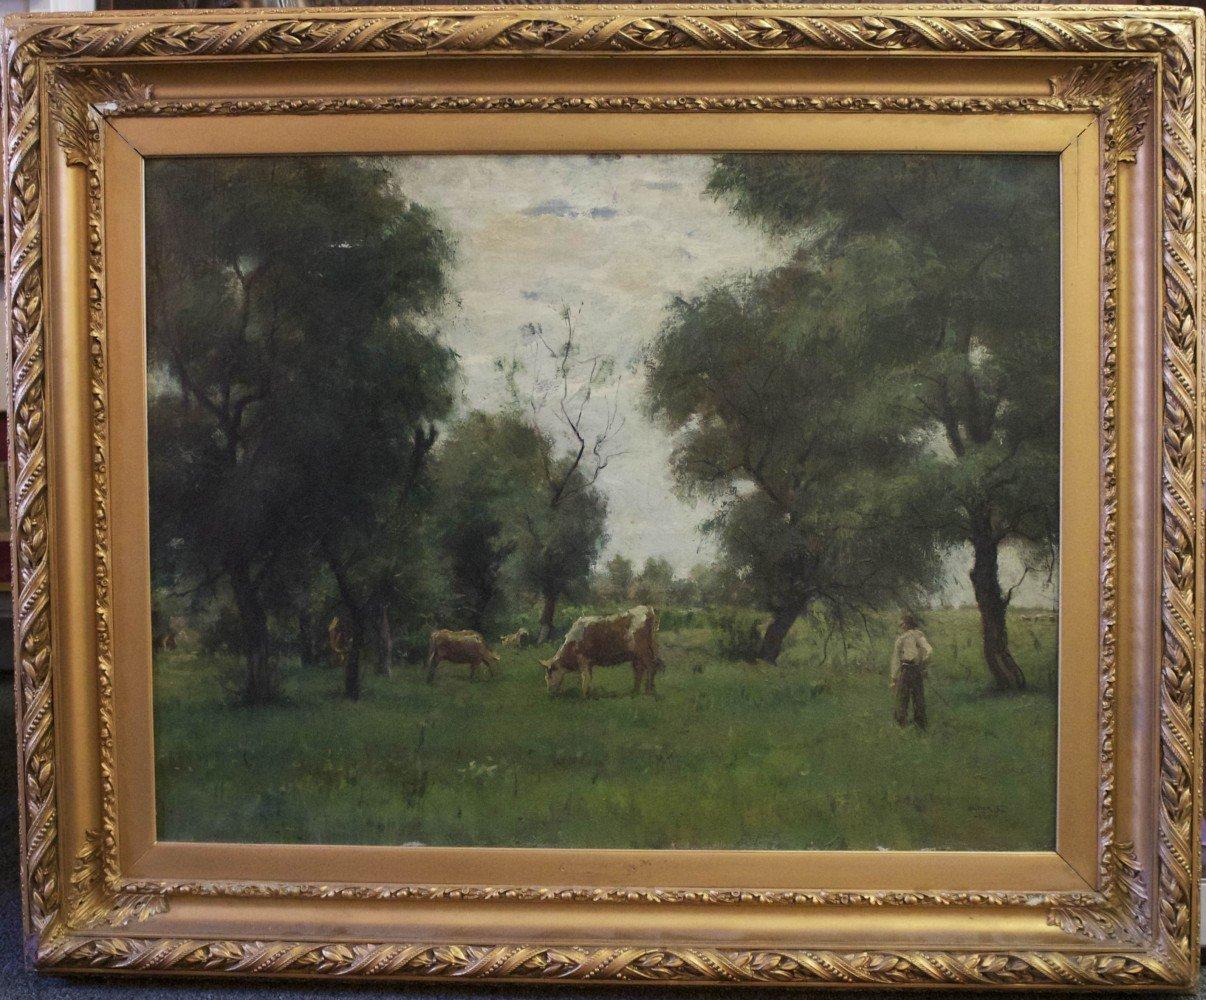 Cattle Grazing in a Spring Field by Janos Laszlo Aldor